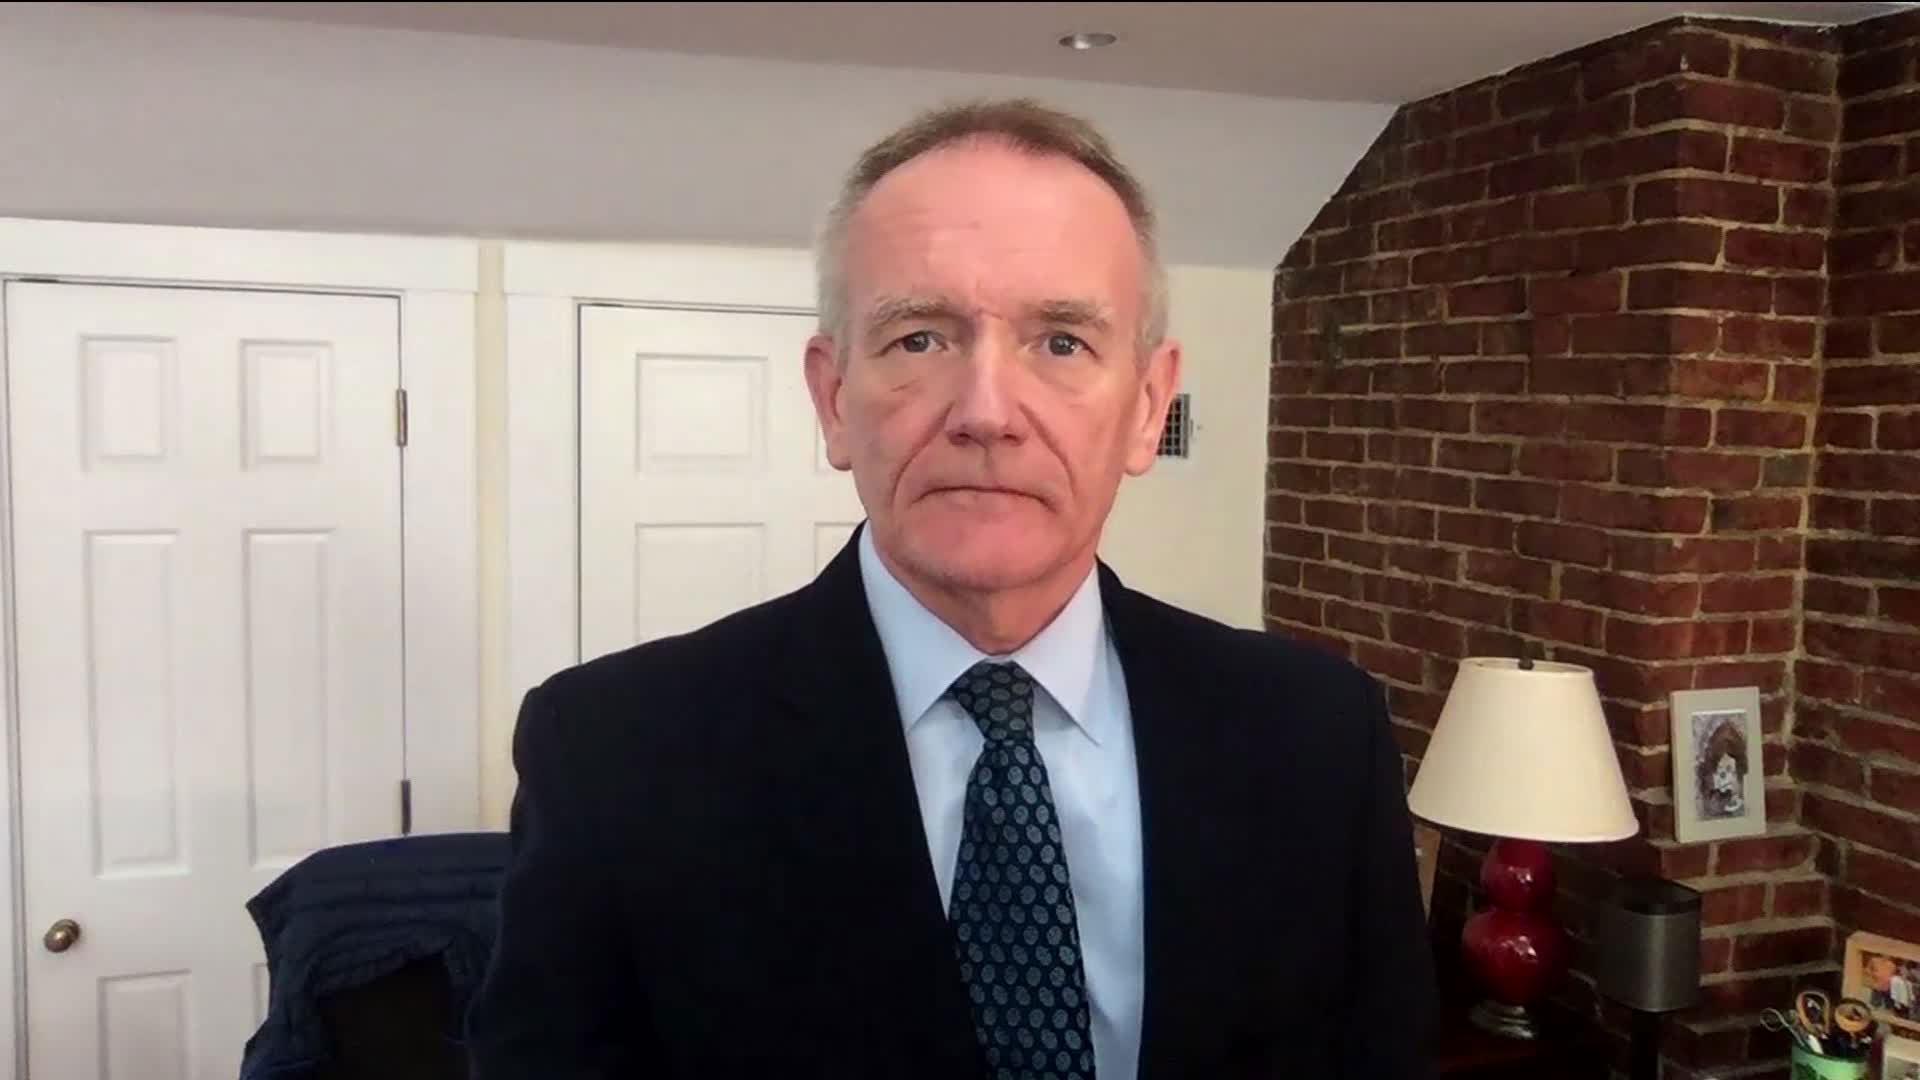 Dr. Troy Brennan on November 20.